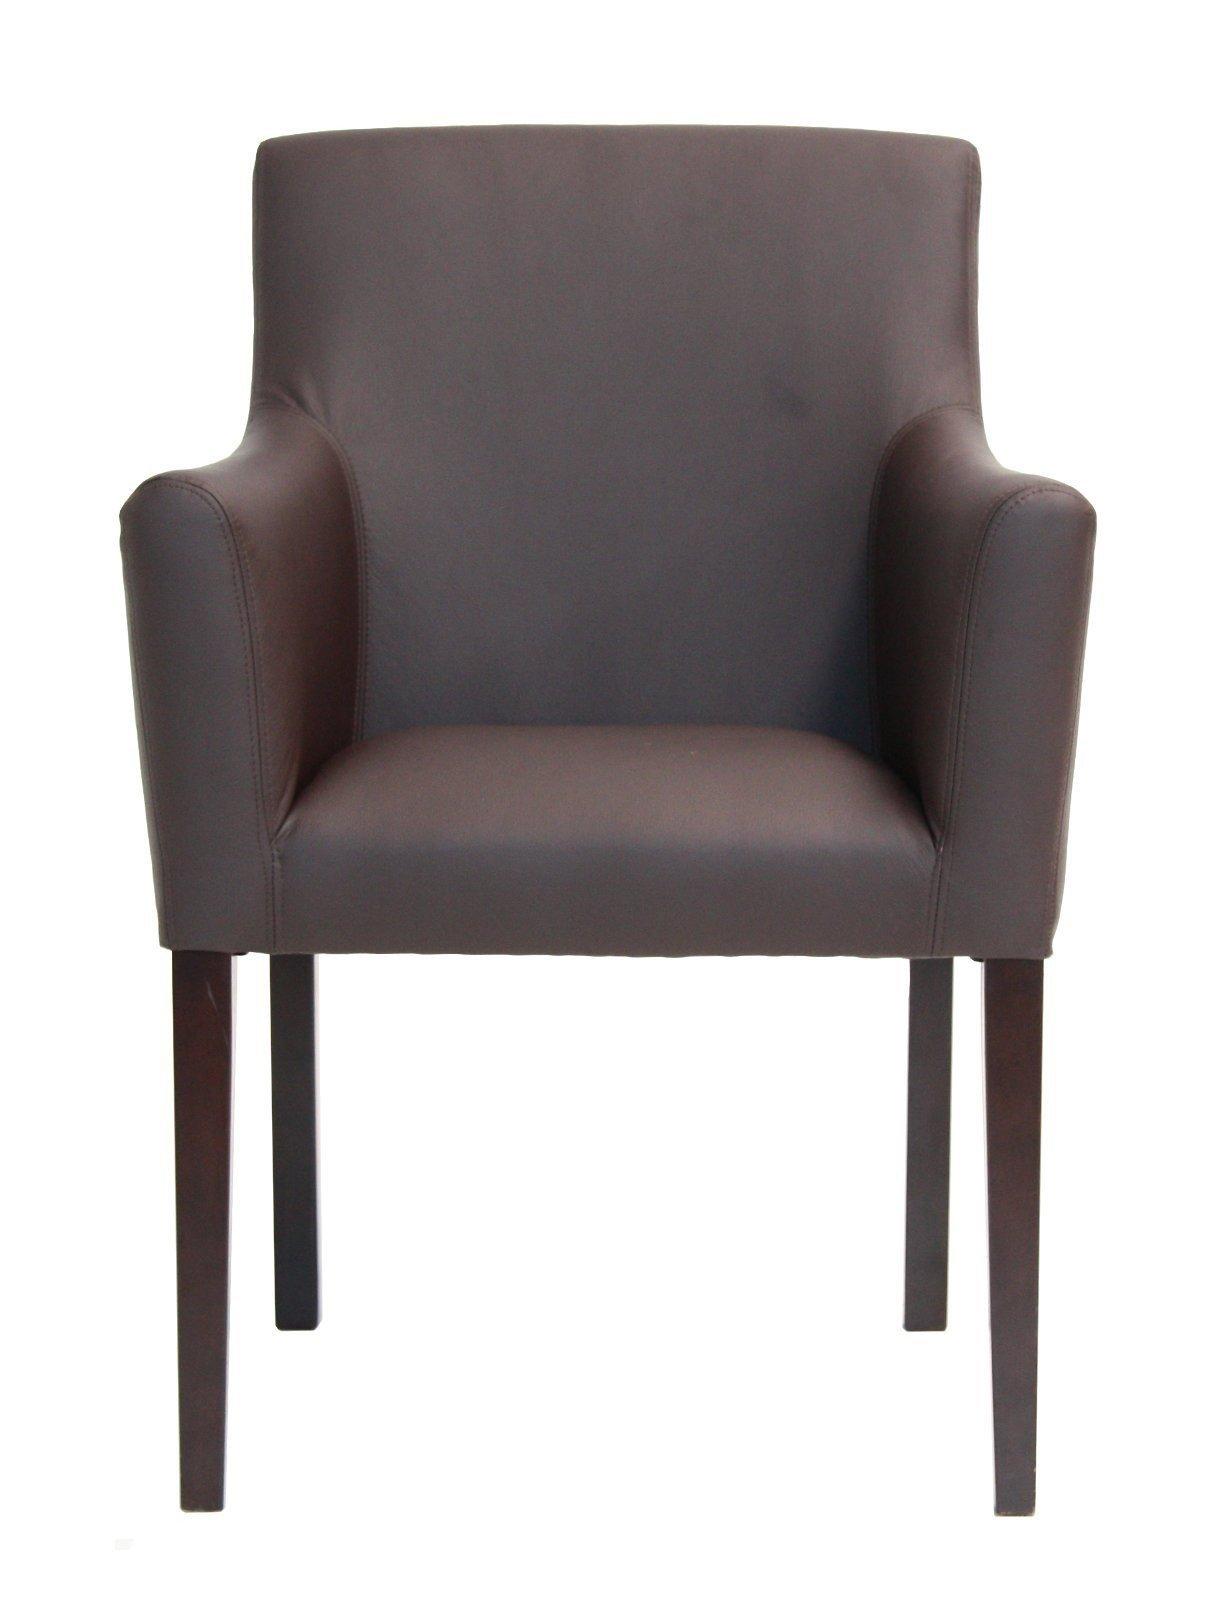 meubelen herstofferen